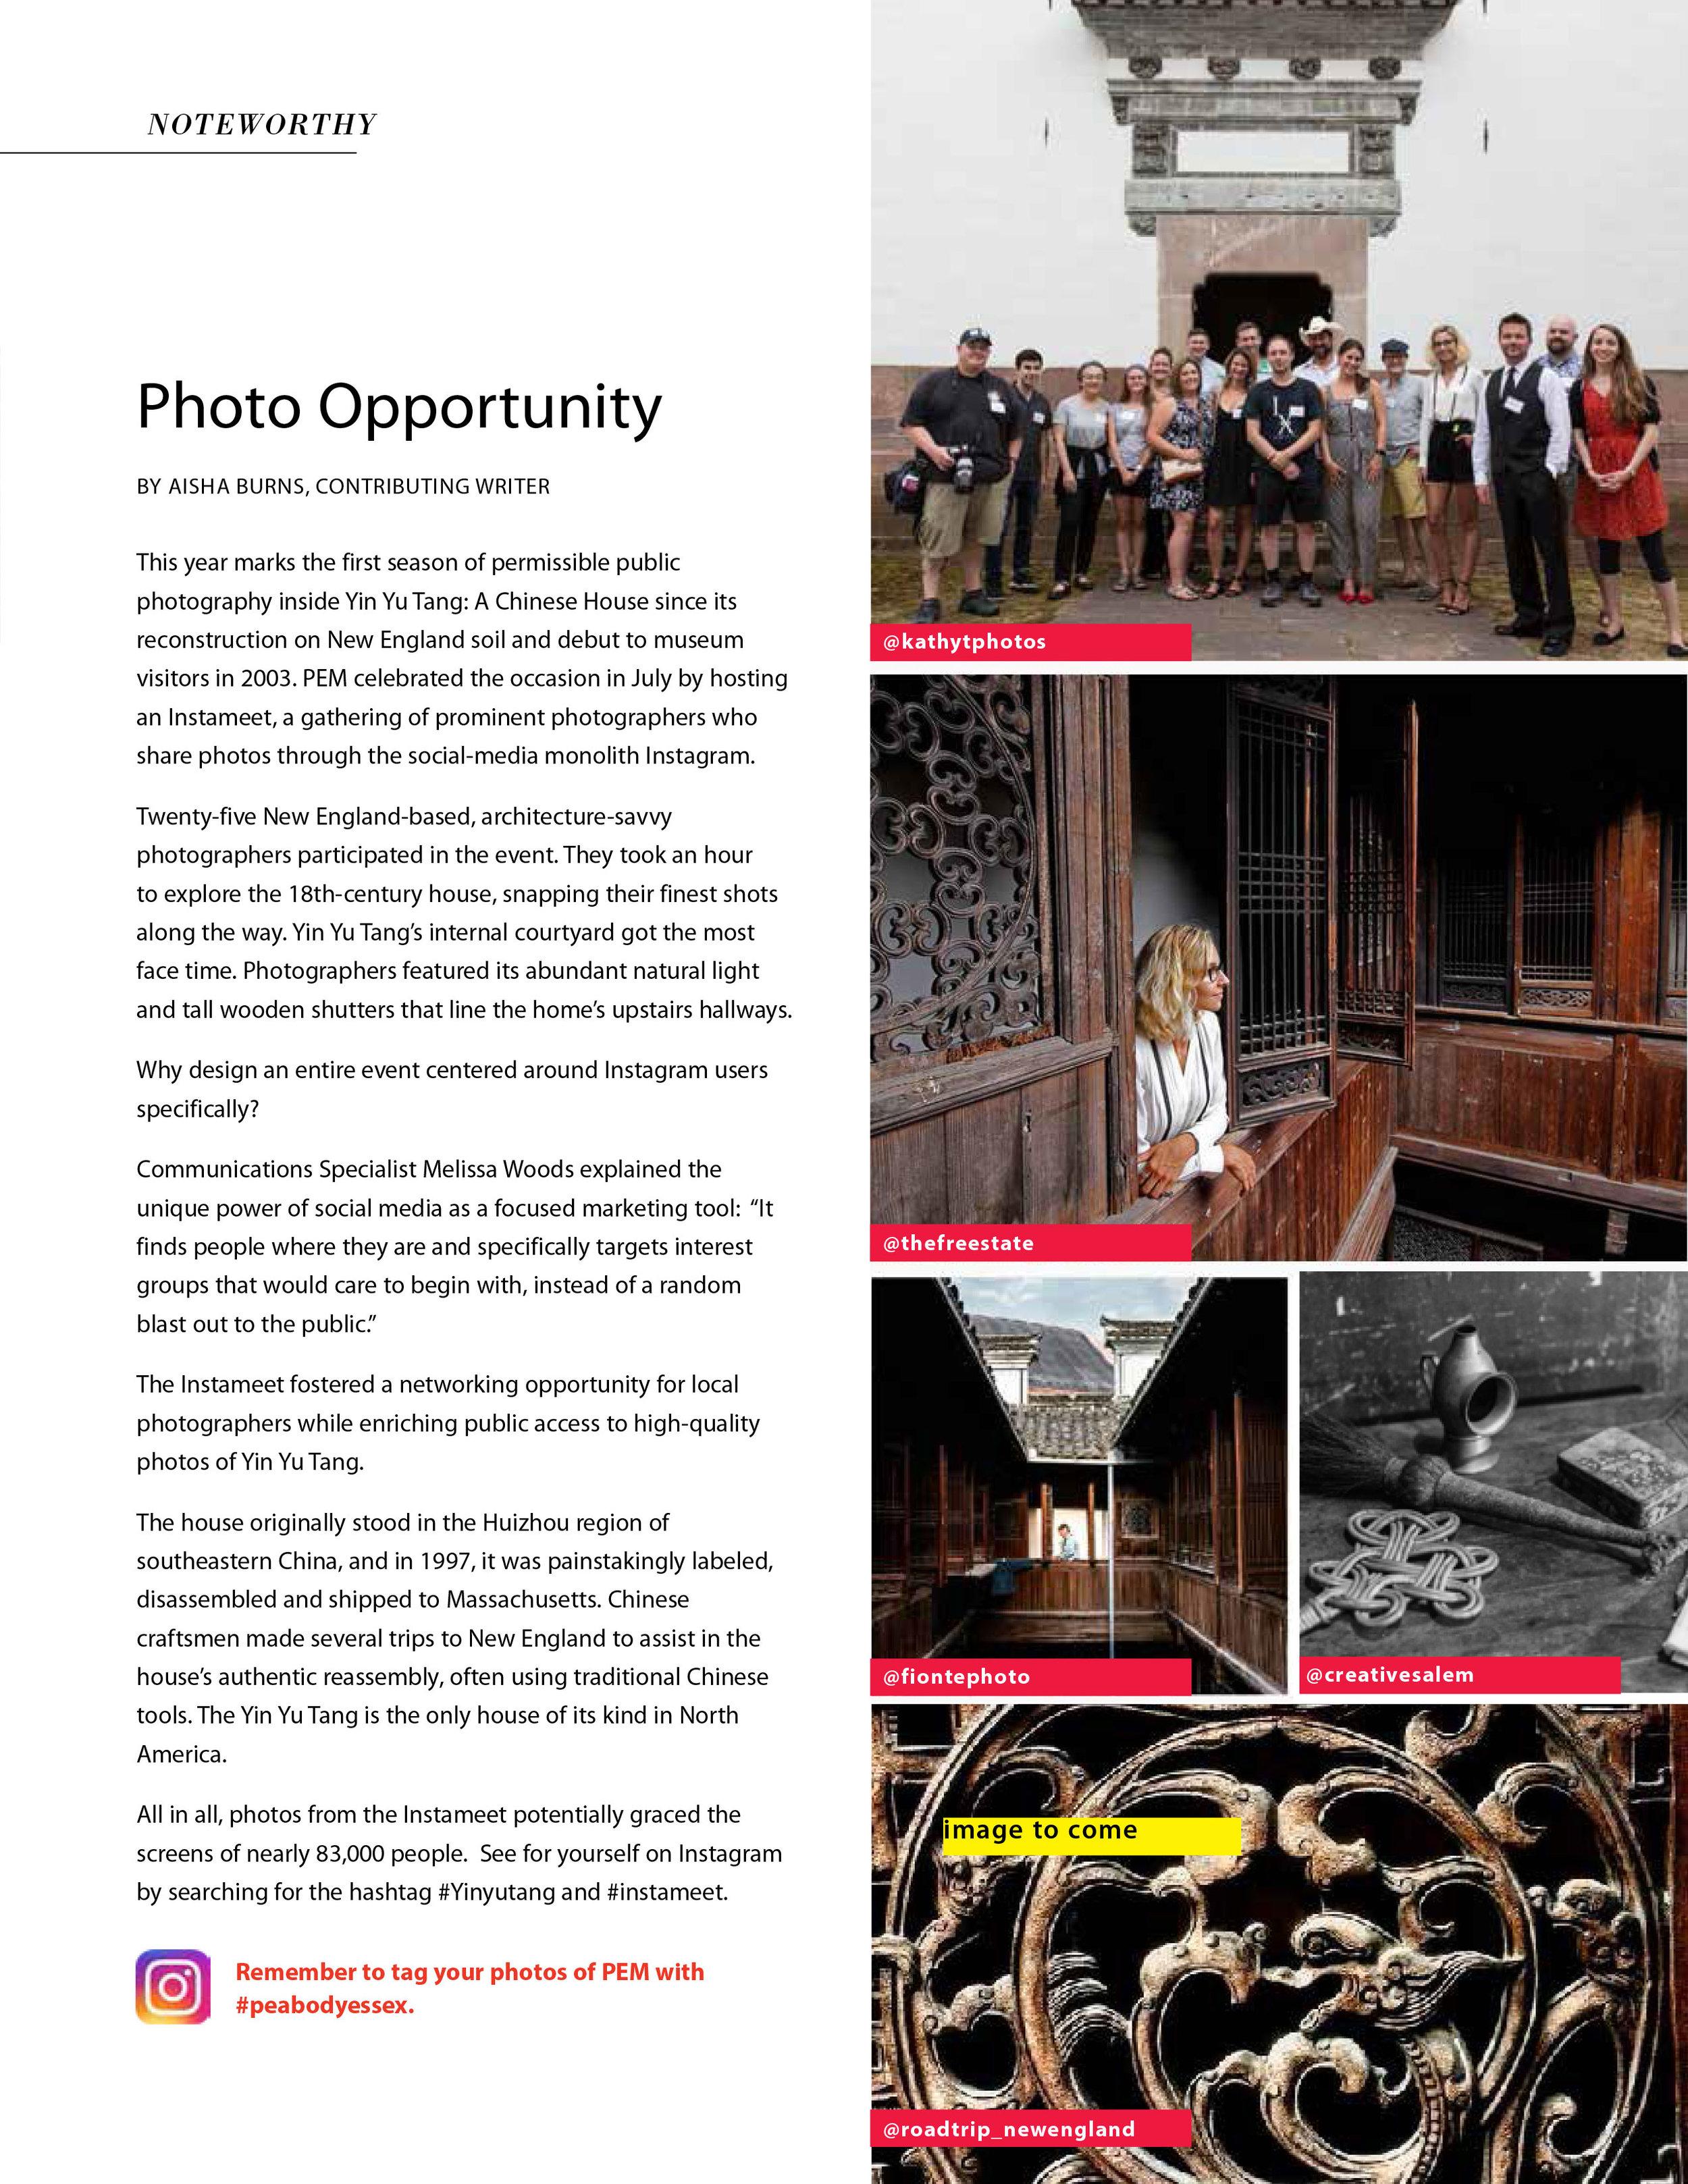 Aisha-Burns-Photo-Opportunity---Connections-Magazine--NovDec2017-11.jpg